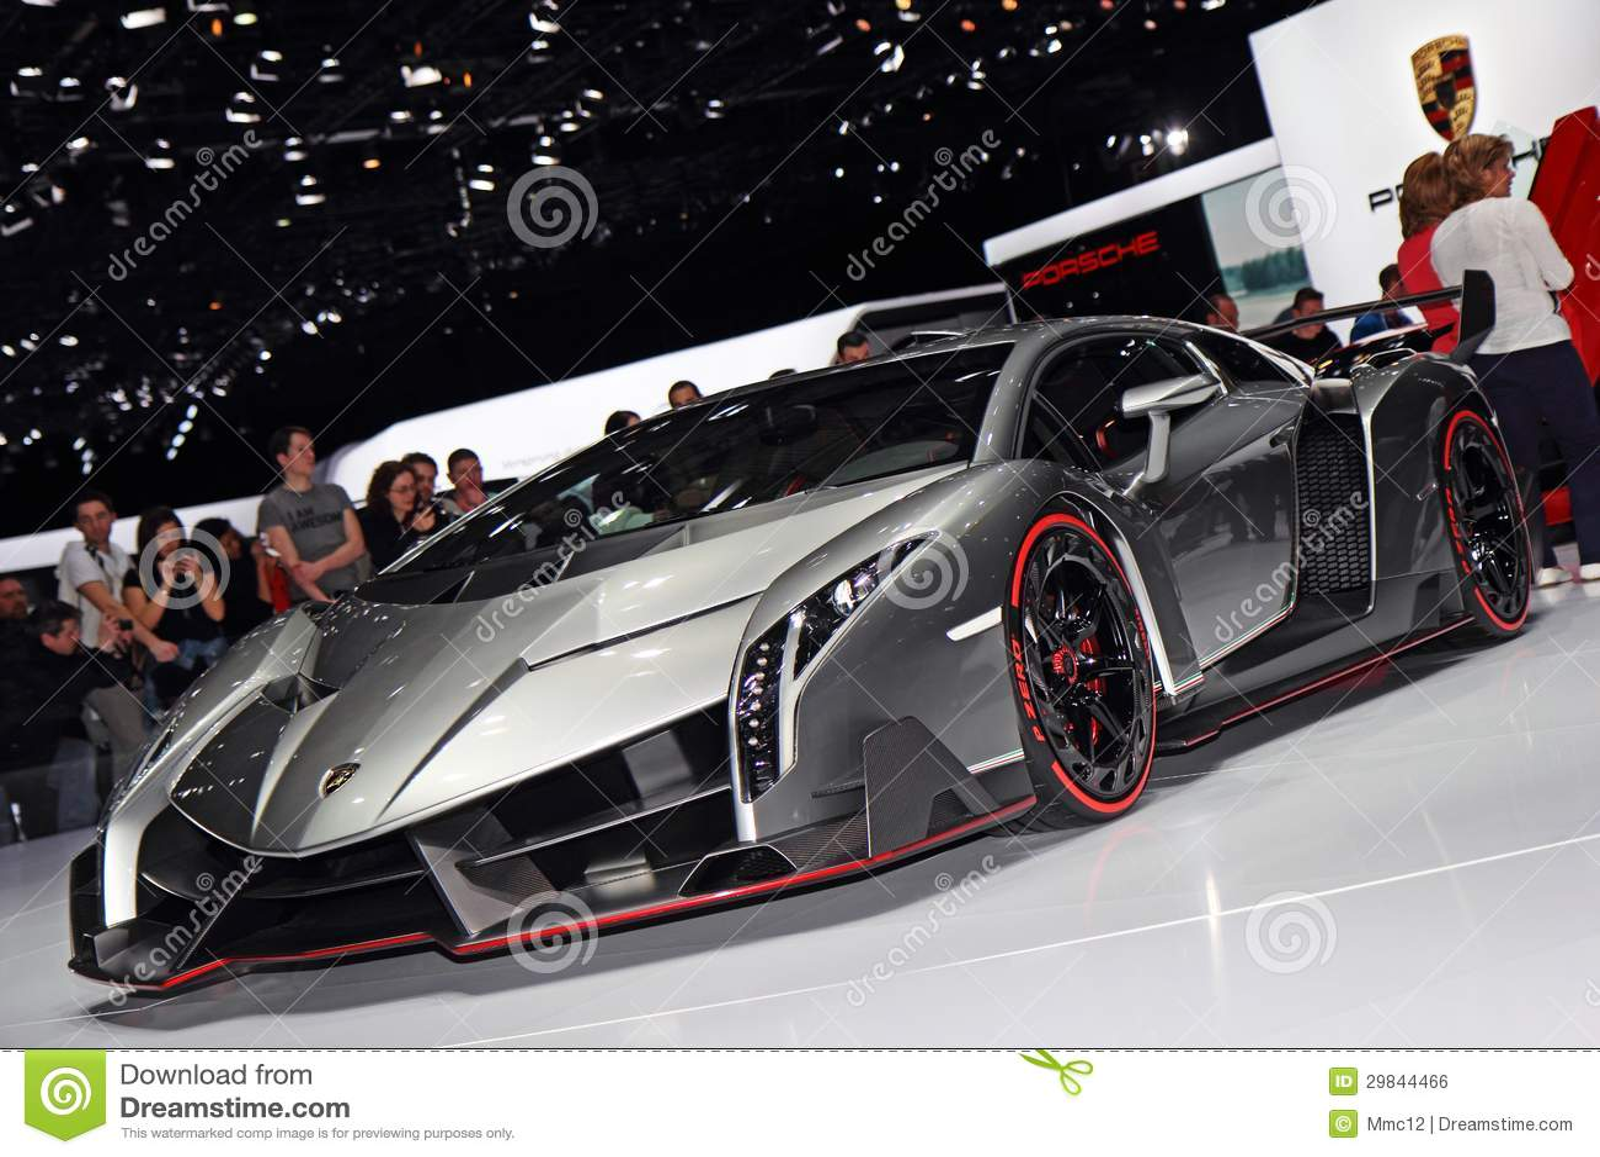 Lamborghini Veneno LP750-4 - exposição automóvel 2013 de Genebra